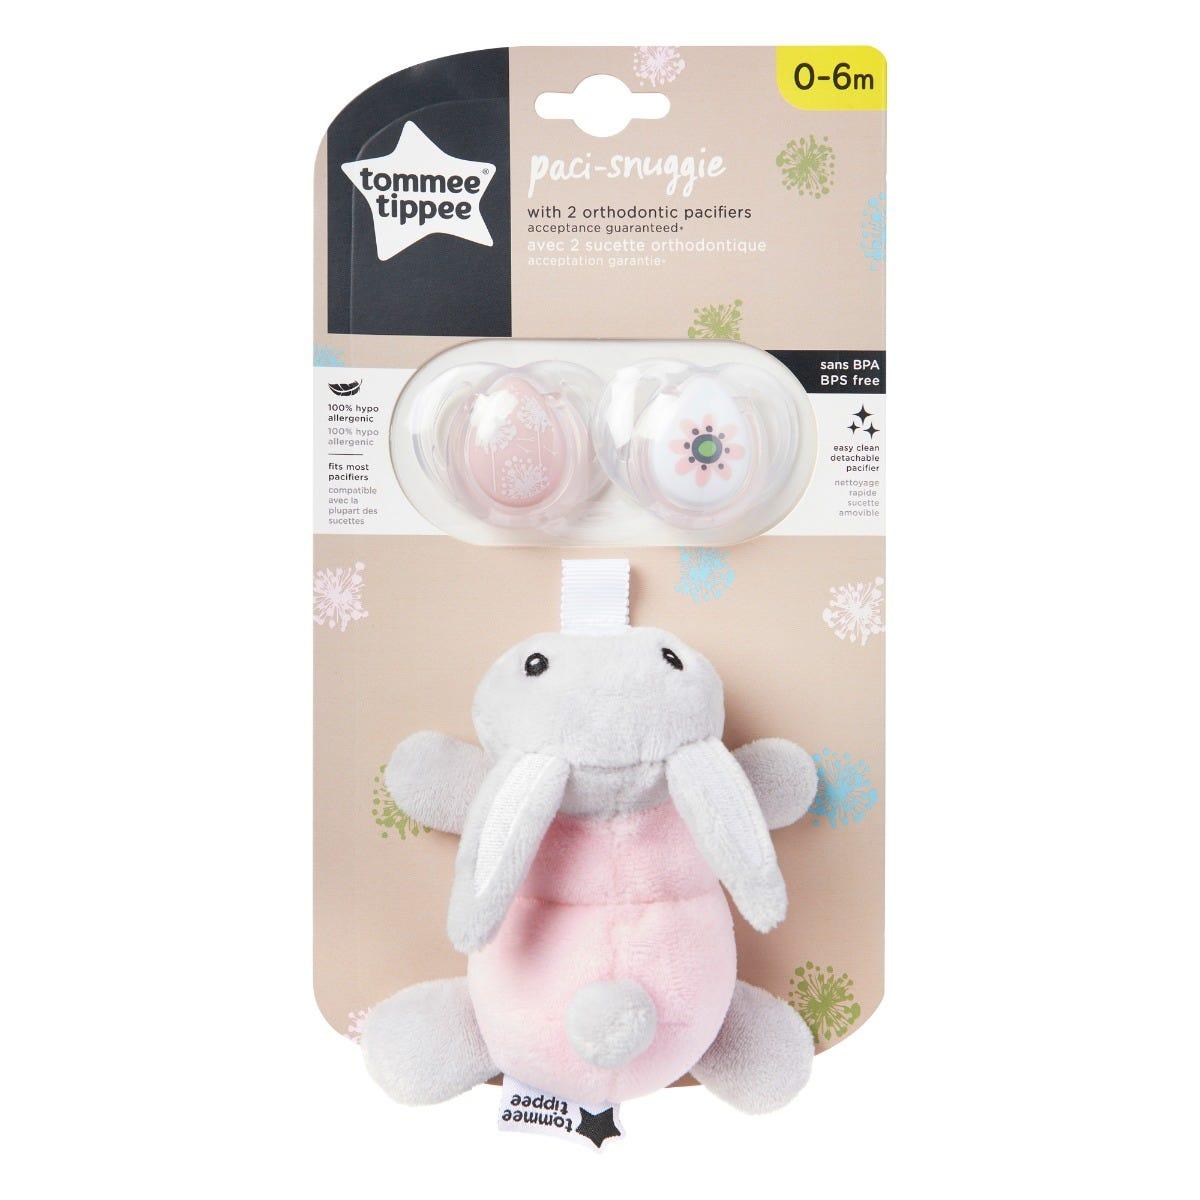 rabbit paci snuggie packaging